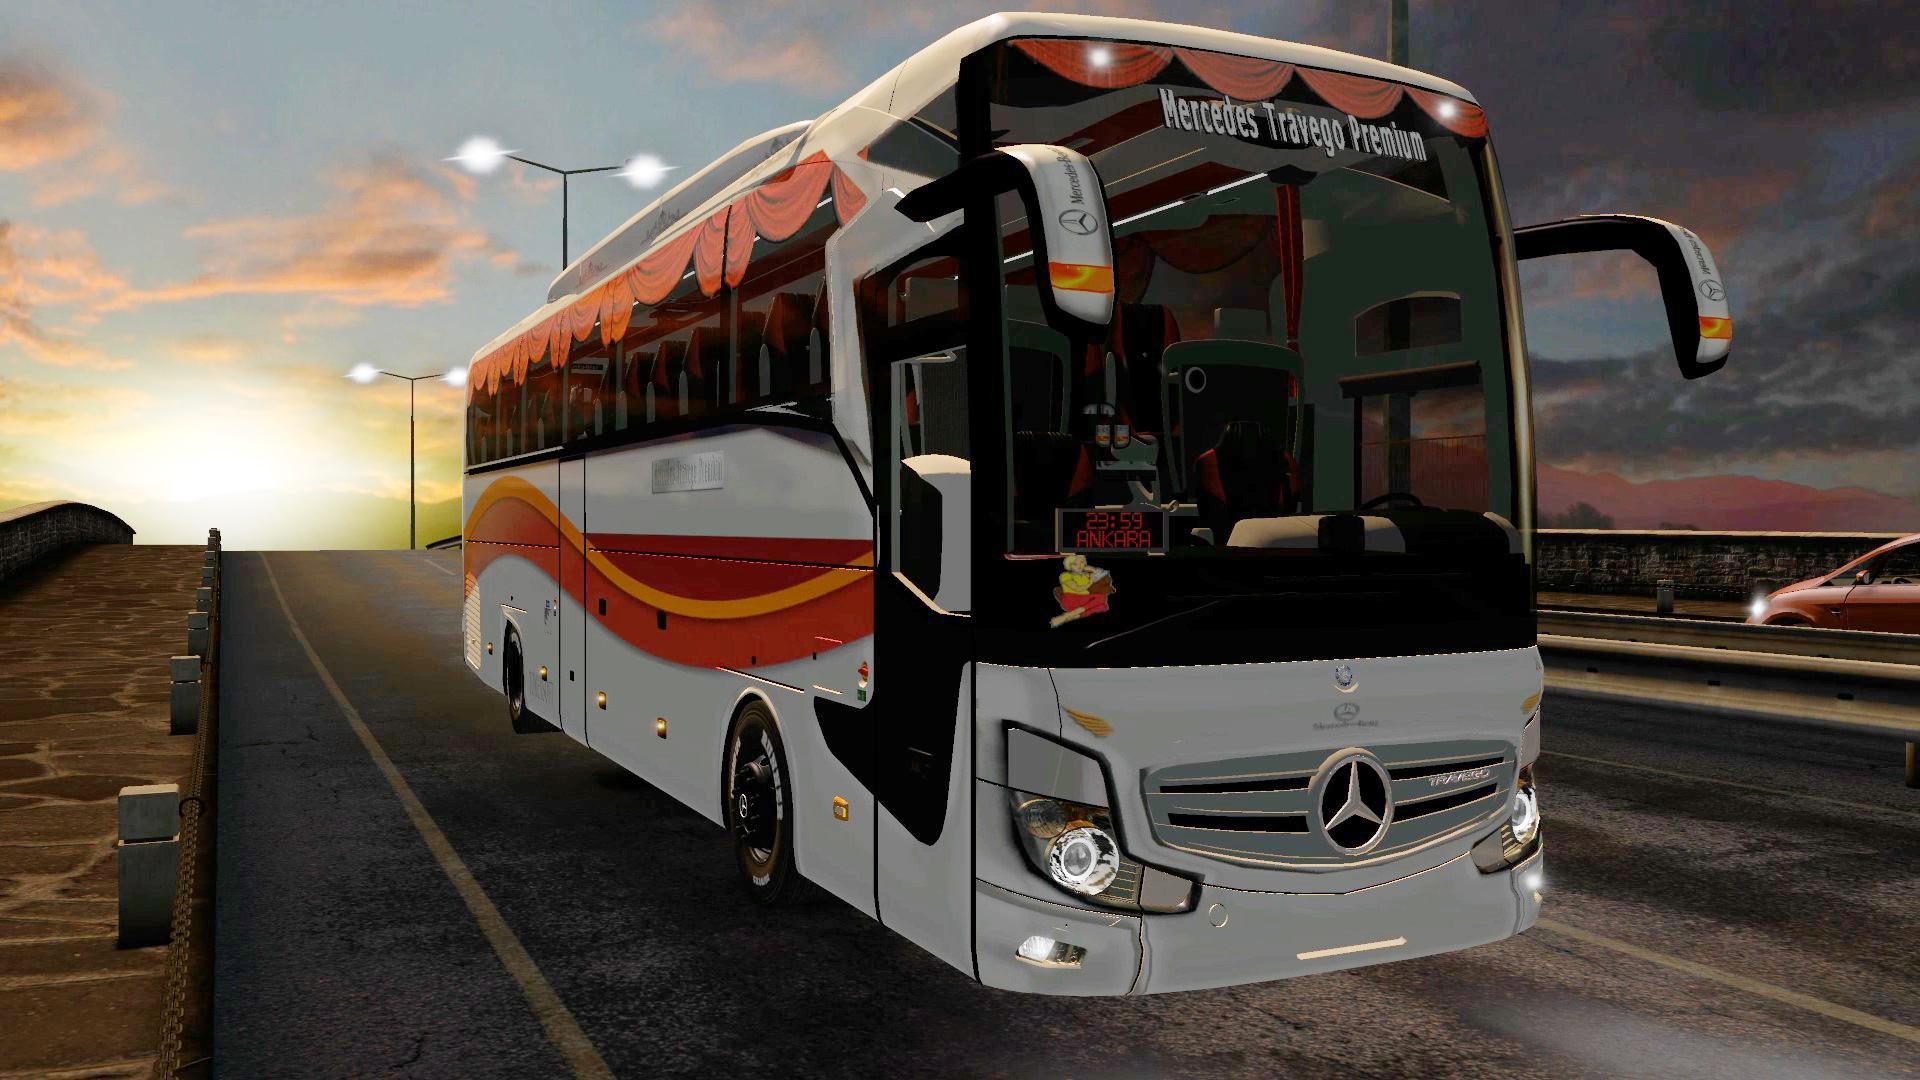 ETS2 - Mercedes Travego Premium 4k Model SHD Skin 2020 V1.0 (1.36.x)